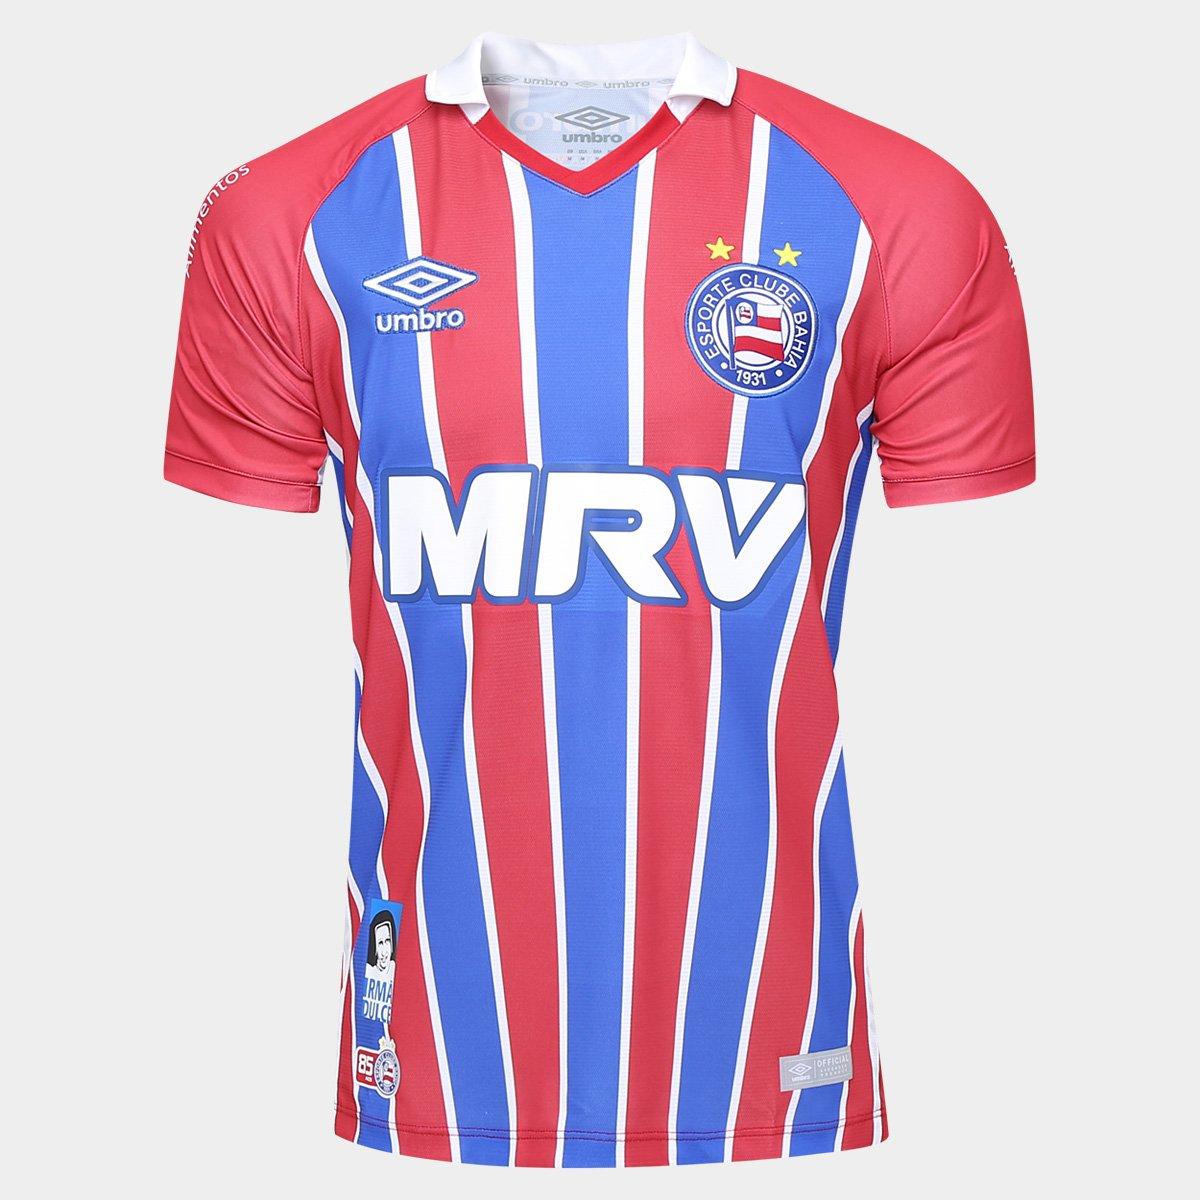 039a55ffb3 Camisa Umbro Bahia II 2016 s nº - Compre Agora